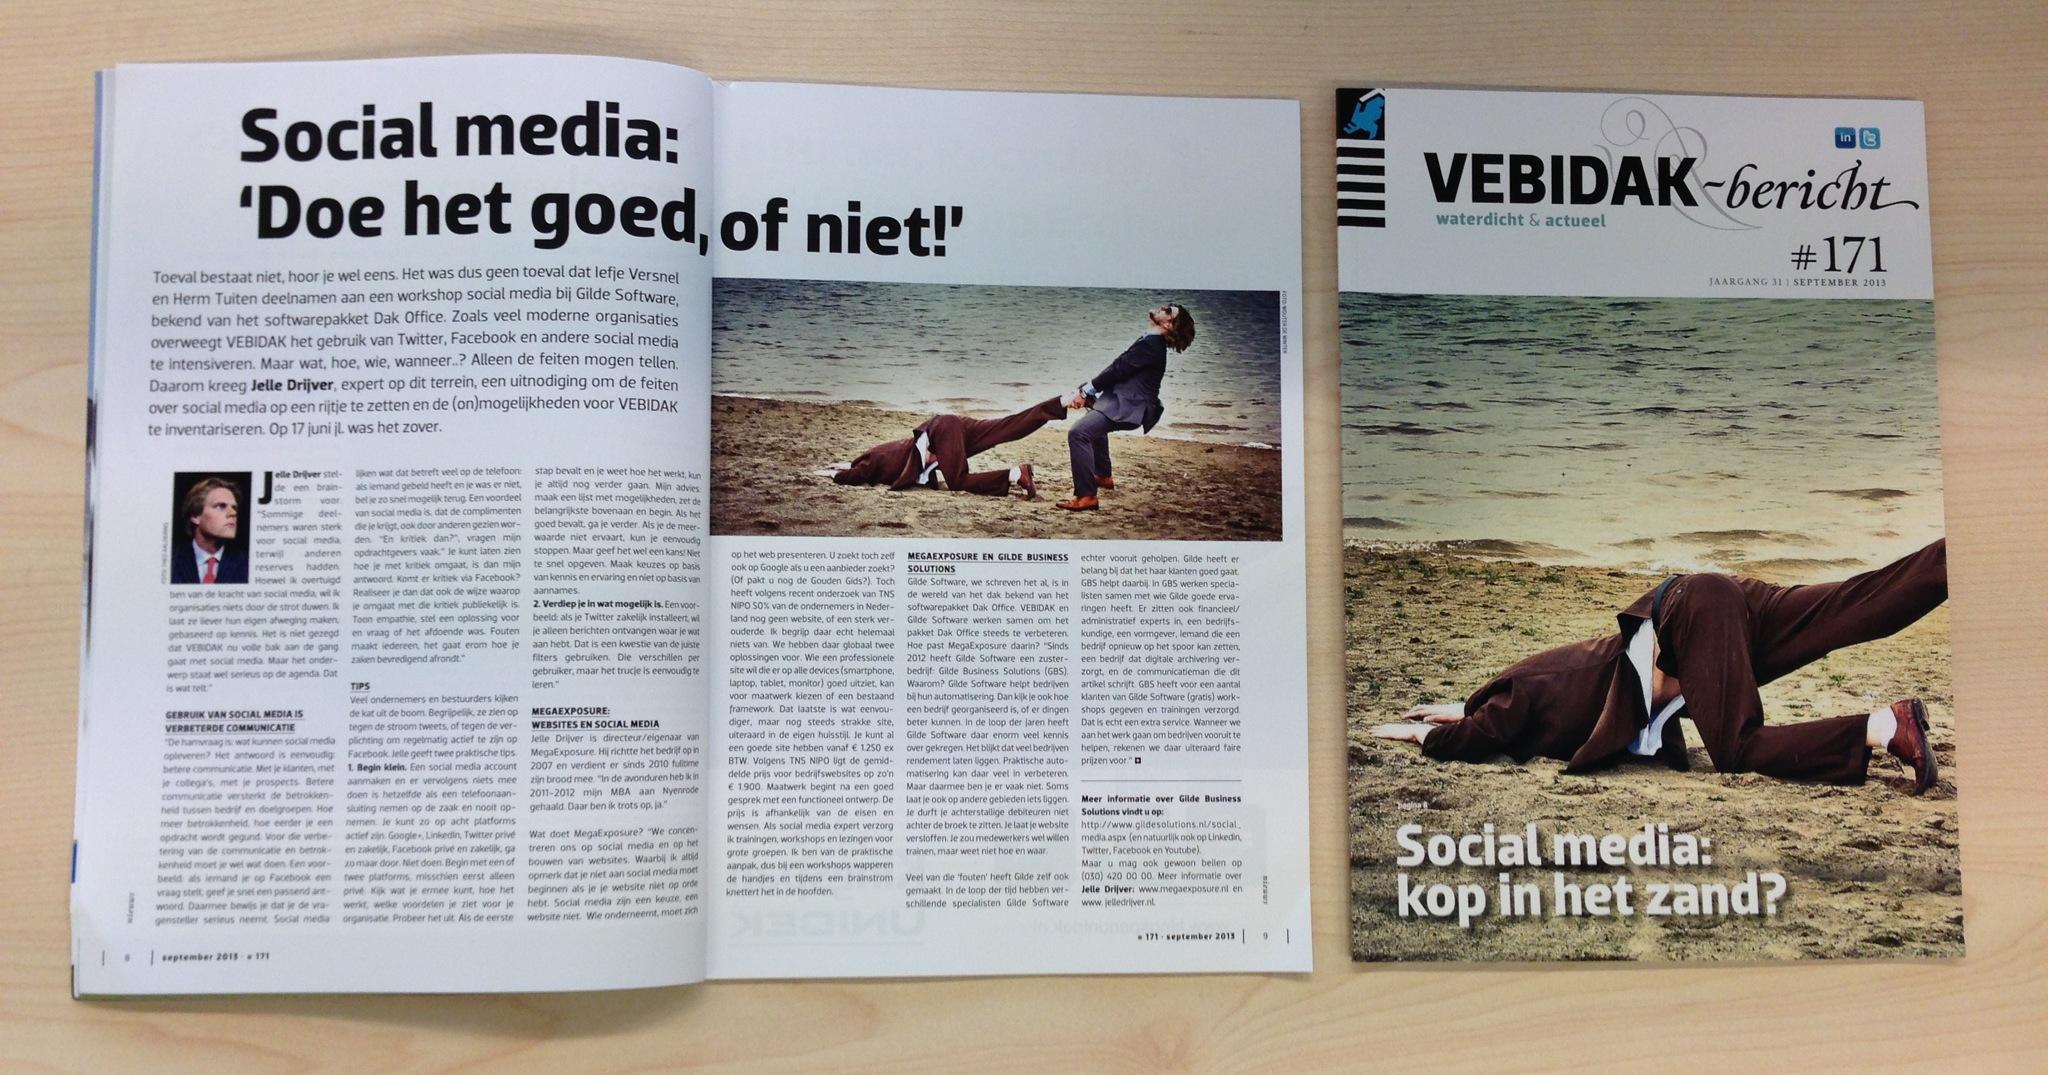 Vebidak Magazine Artikel Jelle Drijver Social Media